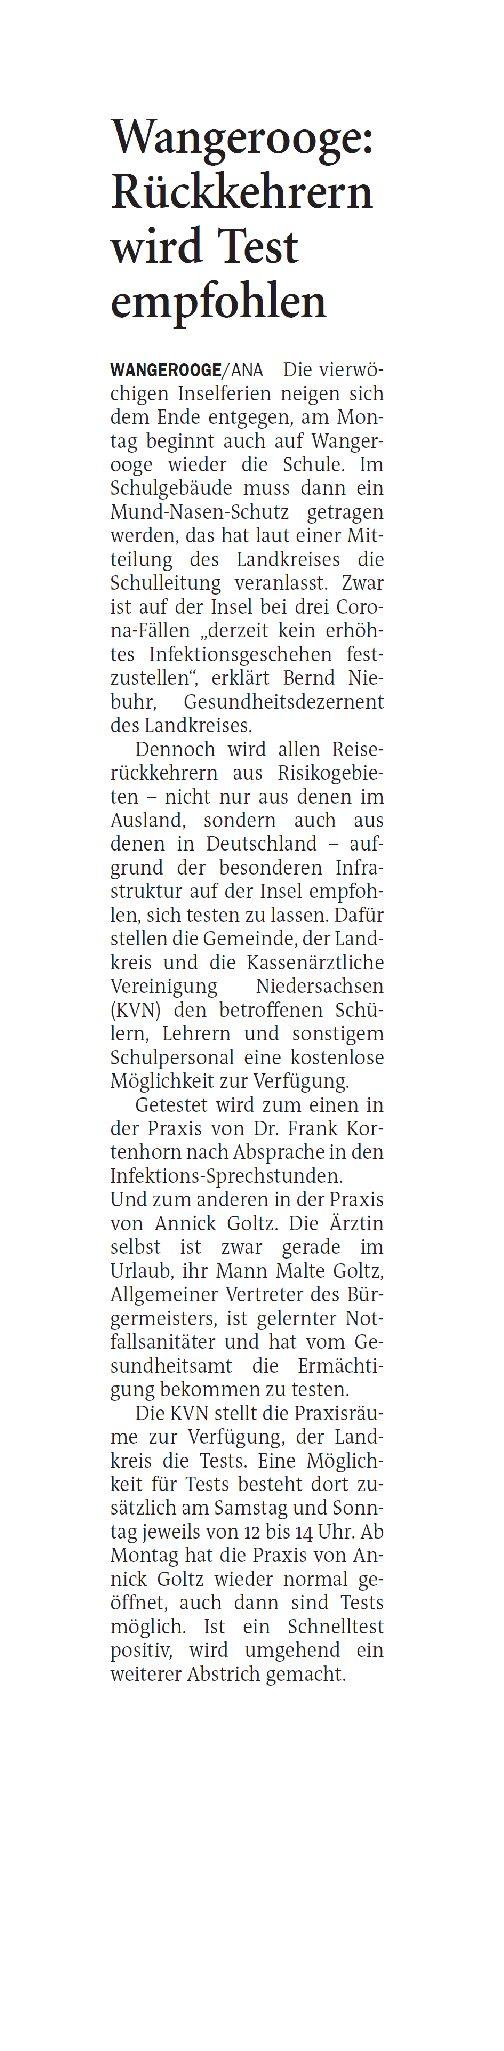 Jeversches Wochenblatt 28.10.2020 III